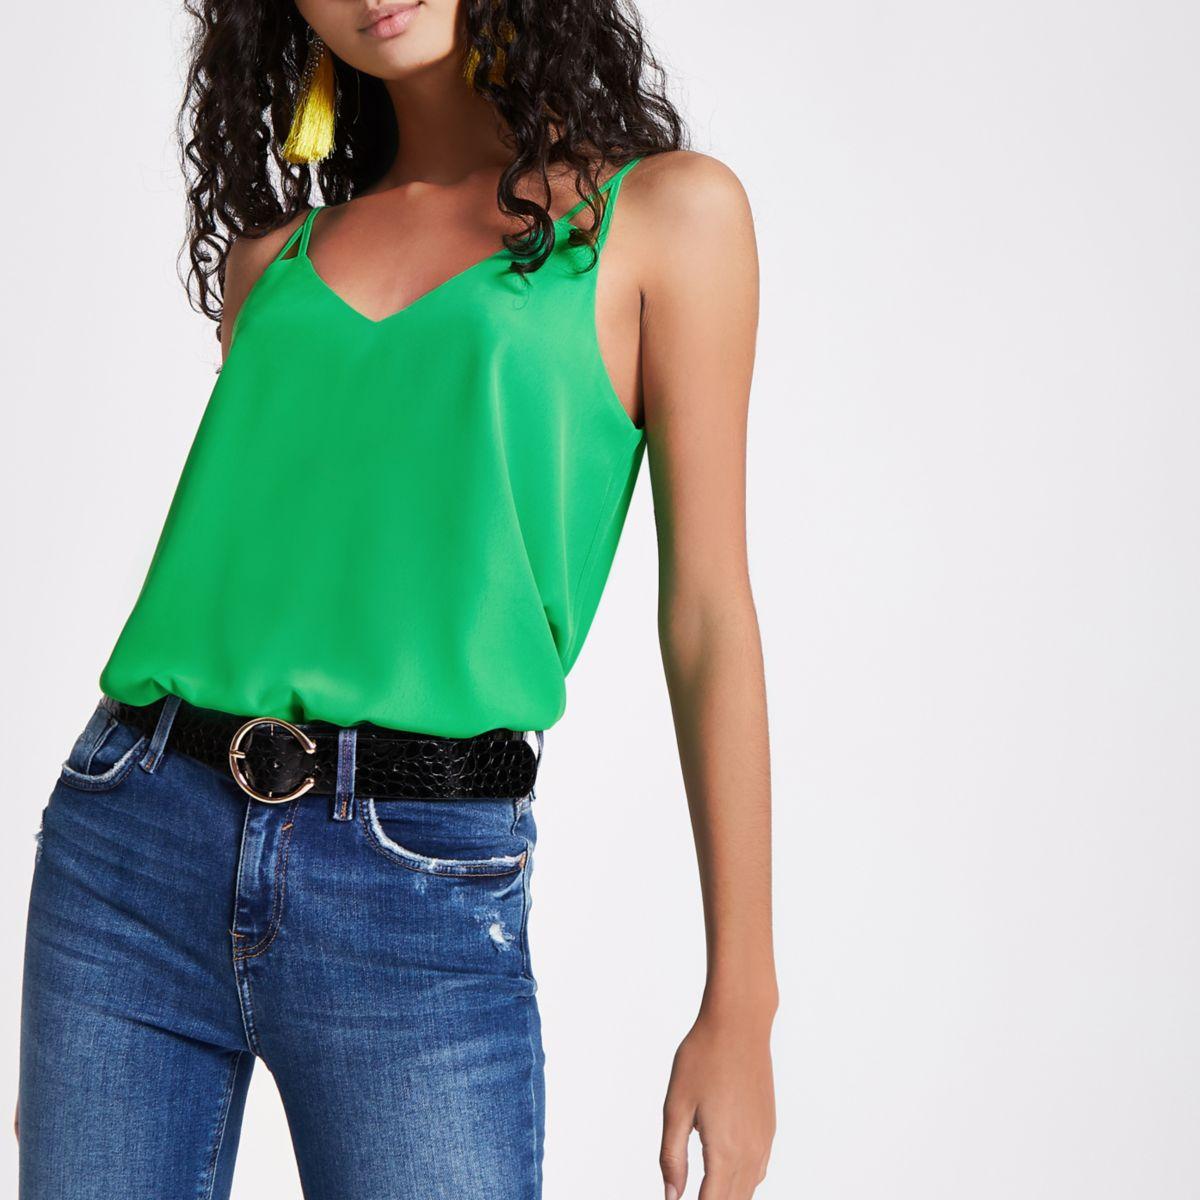 Green V neck cami vest top